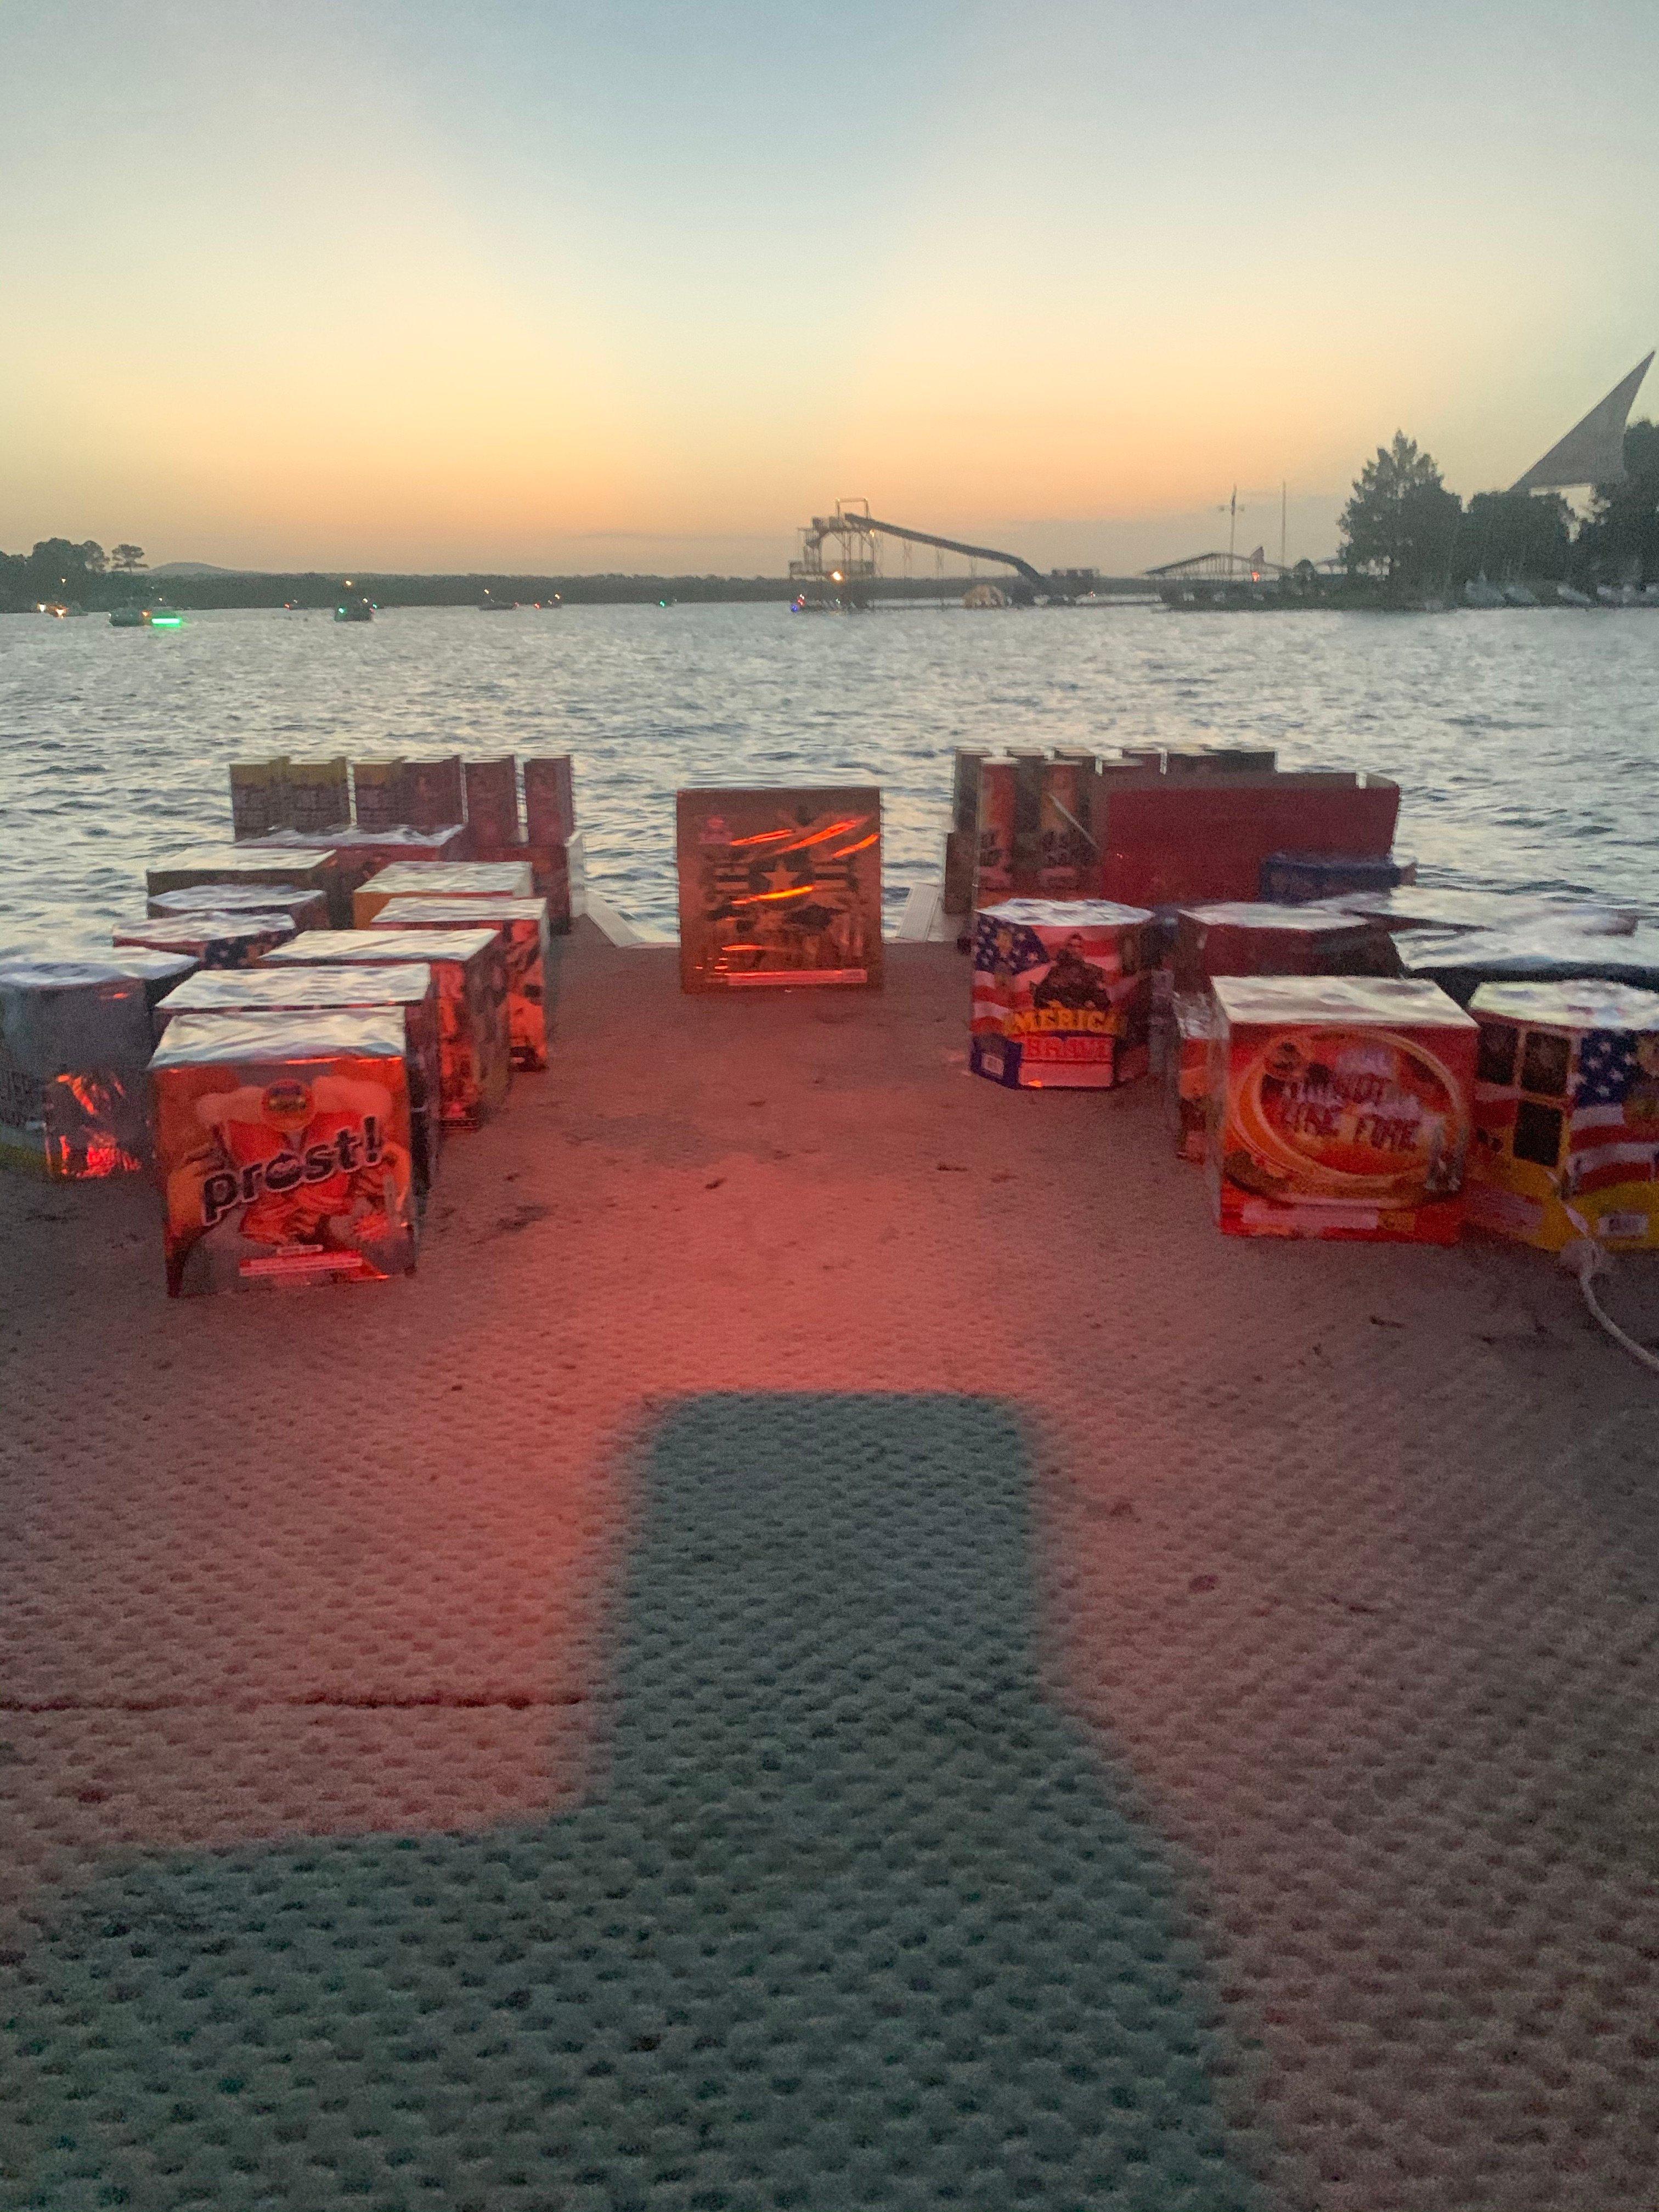 Fireworks cache